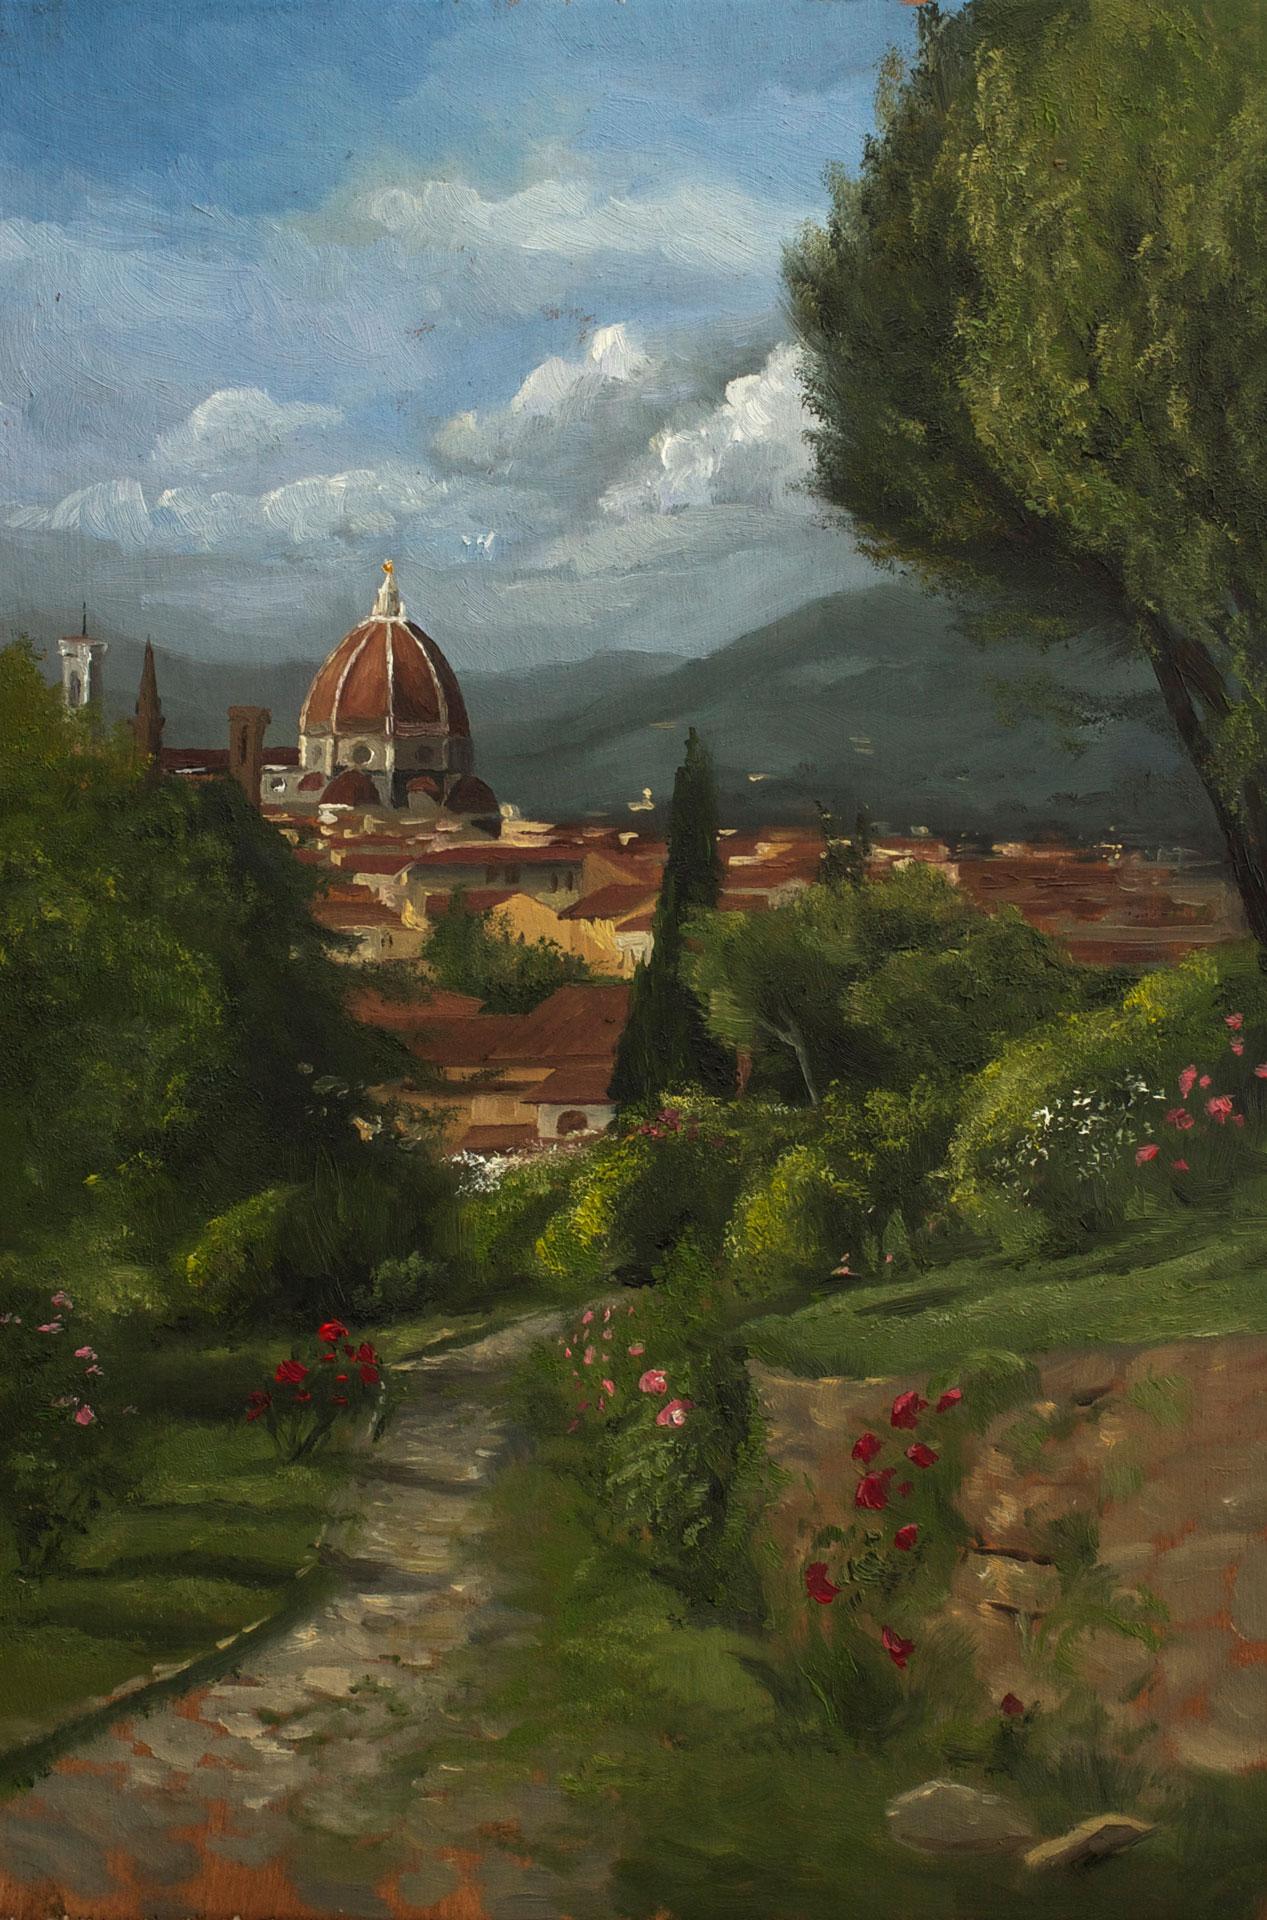 Sahra Becherer Plein air Giardino delle Rose Firenze 052015 - Sahra Becherer (Teacher)